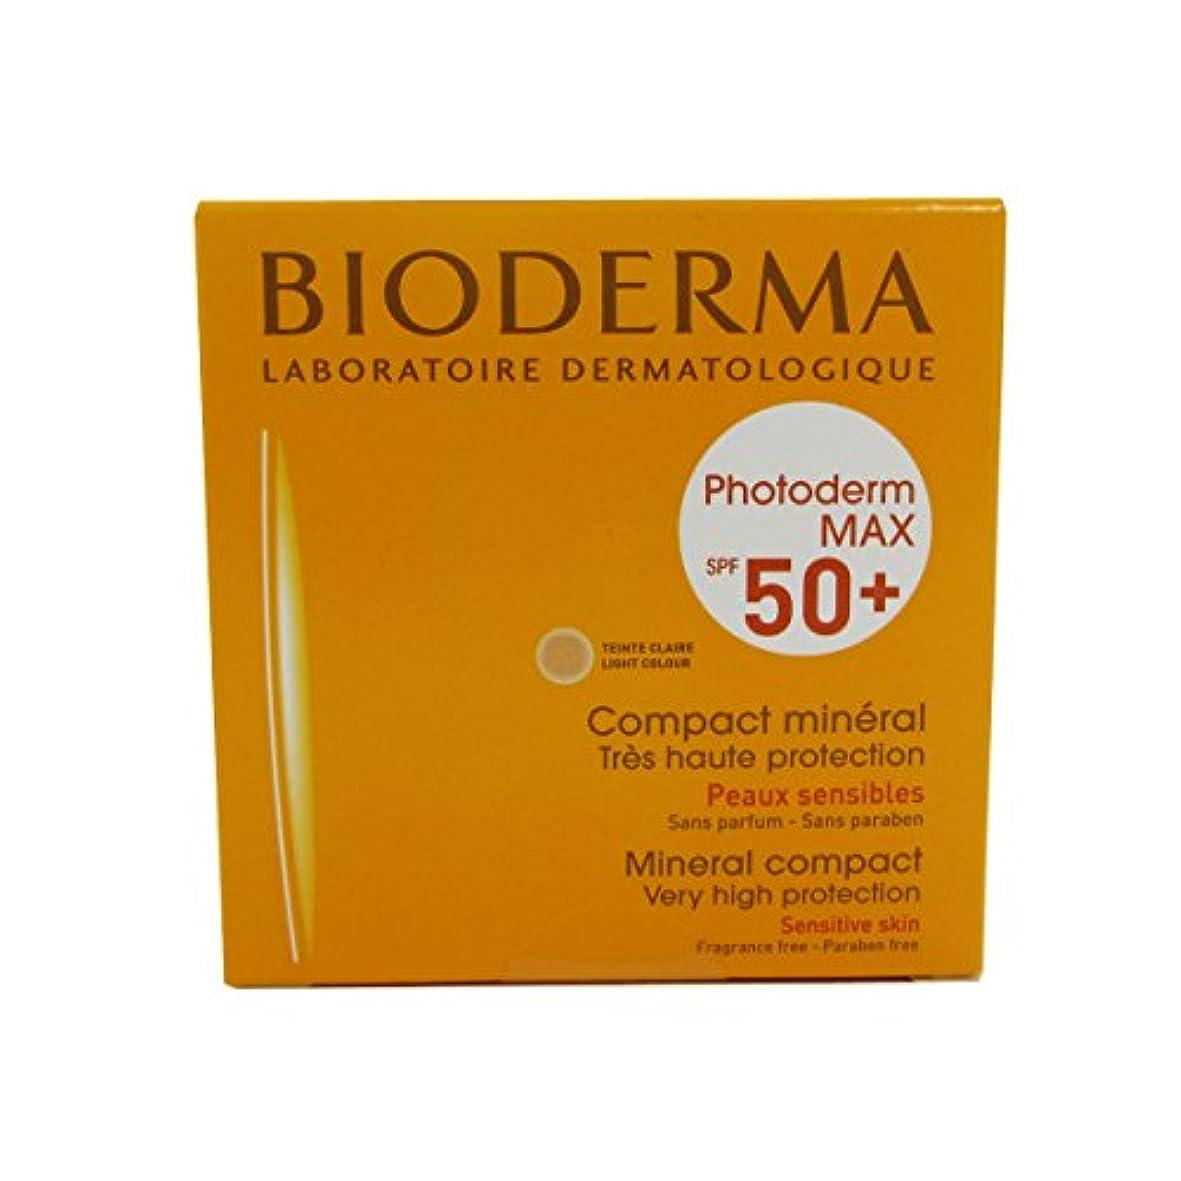 腕海岸急降下Bioderma Photoderm Max Compact Mineral 50+ Light 10g [並行輸入品]